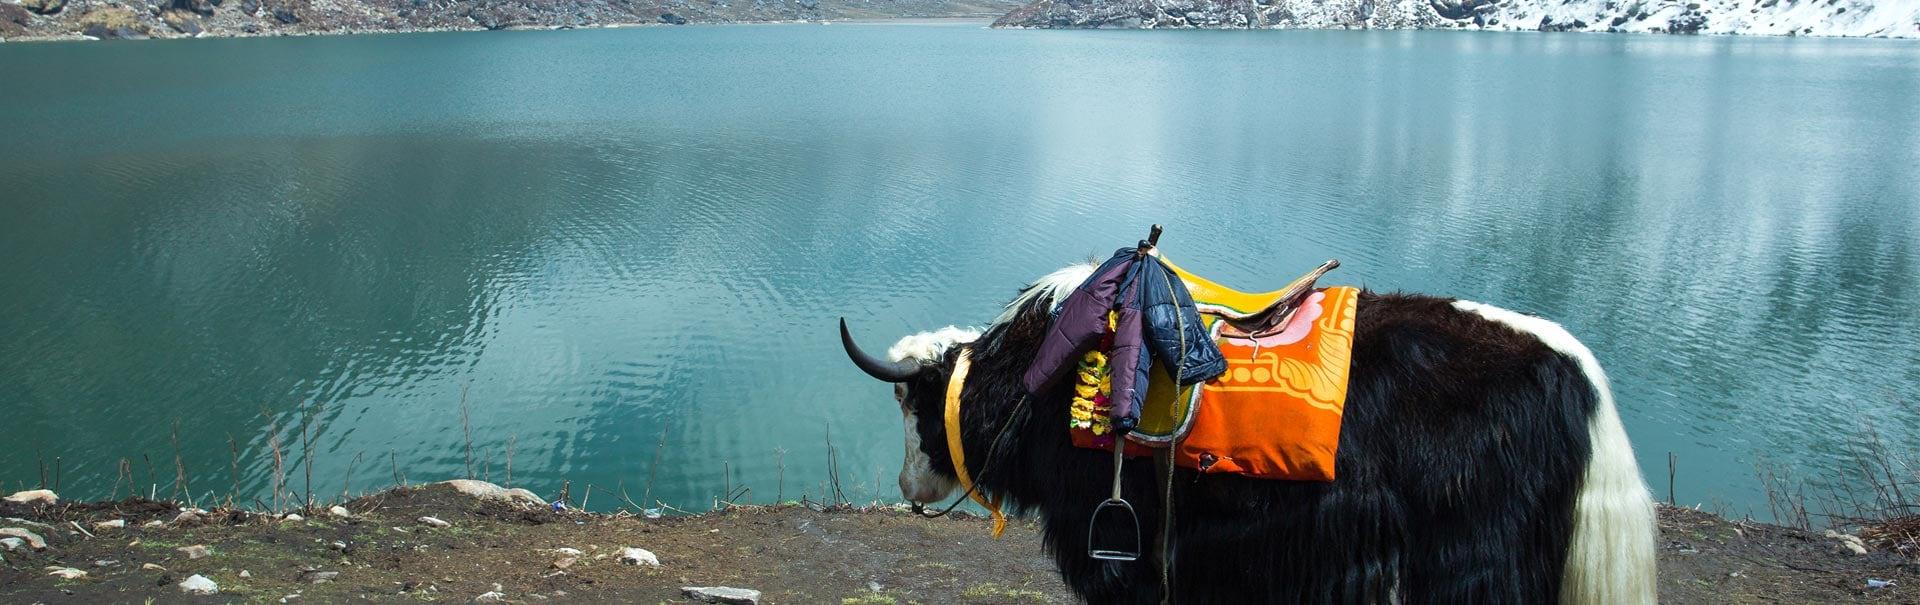 imageUrlhttps://img.veenaworld.com/customized-holidays/india/sikkim-darjeeling/shsd1/shsd1-bnn-1.jpg